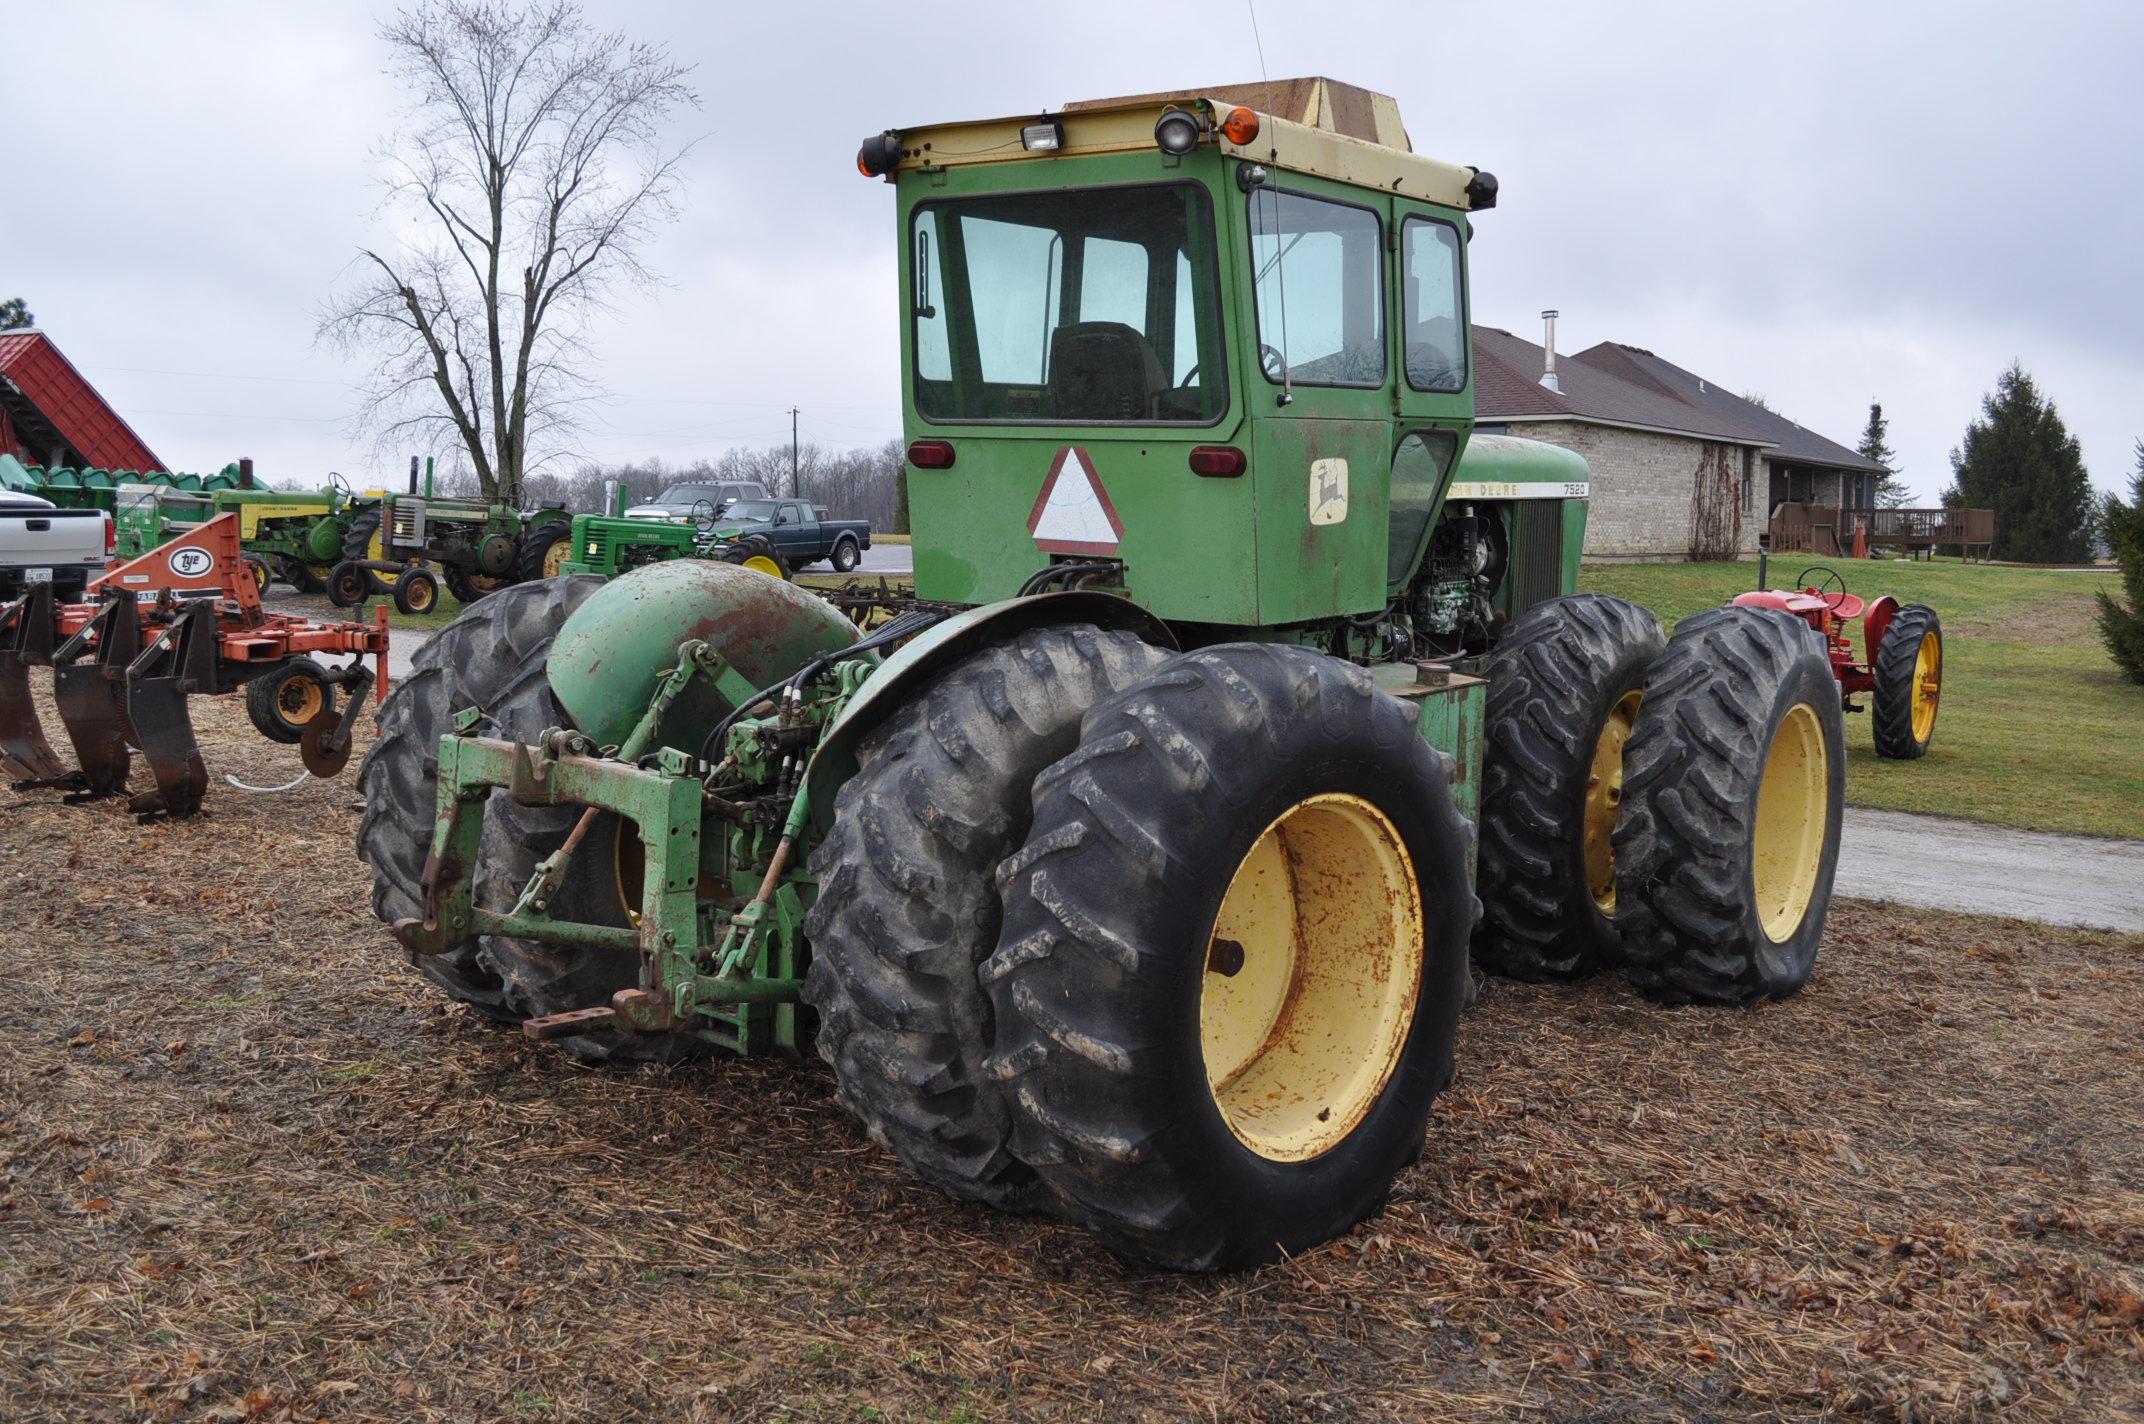 John Deere 7520 tractor, 4WD, diesel, 18.4-34 duals, original fenders, CHA, cab interior kit, 3 - Image 3 of 24